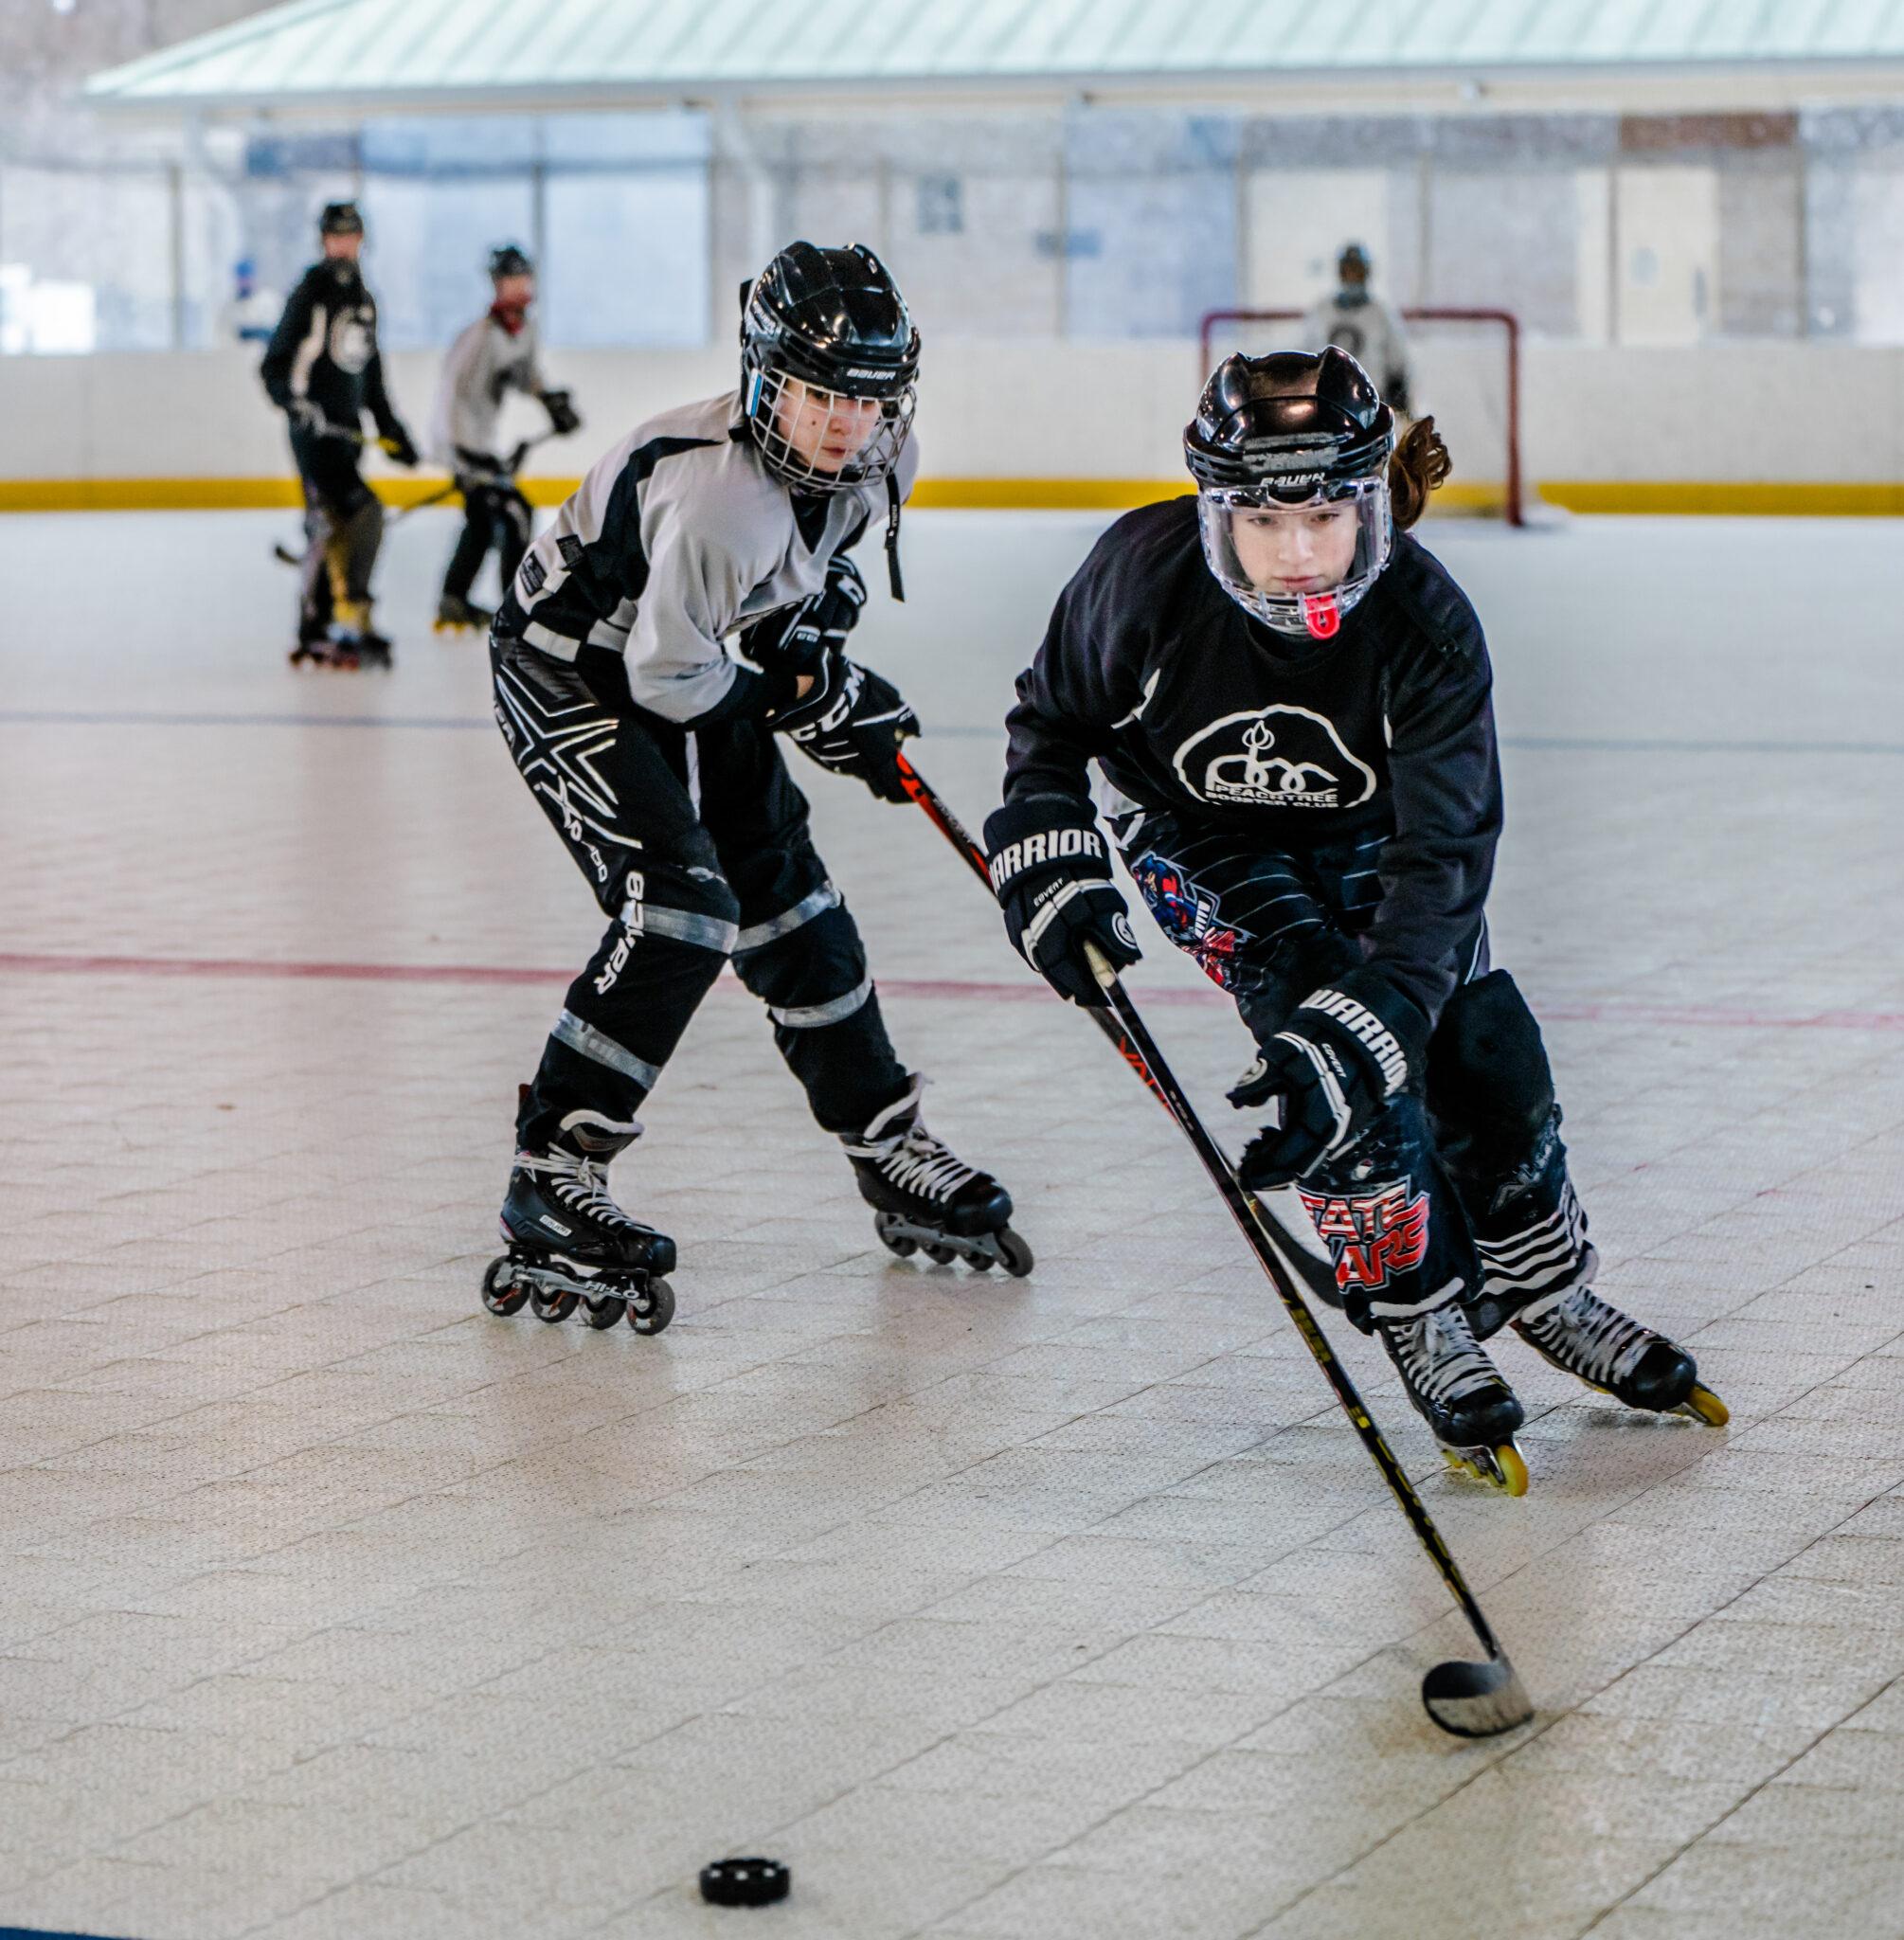 Norcross Roller Hockey